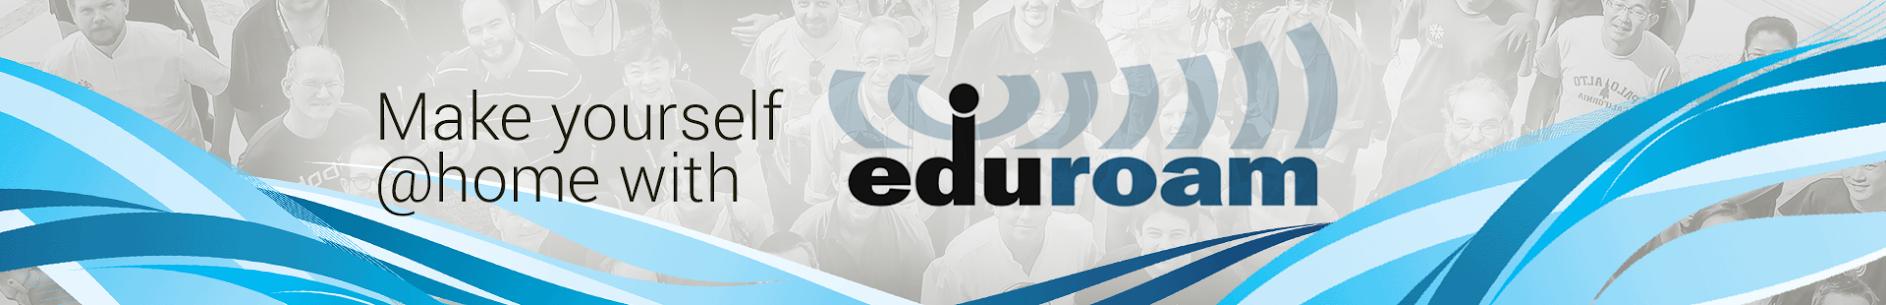 banner-eduroam2